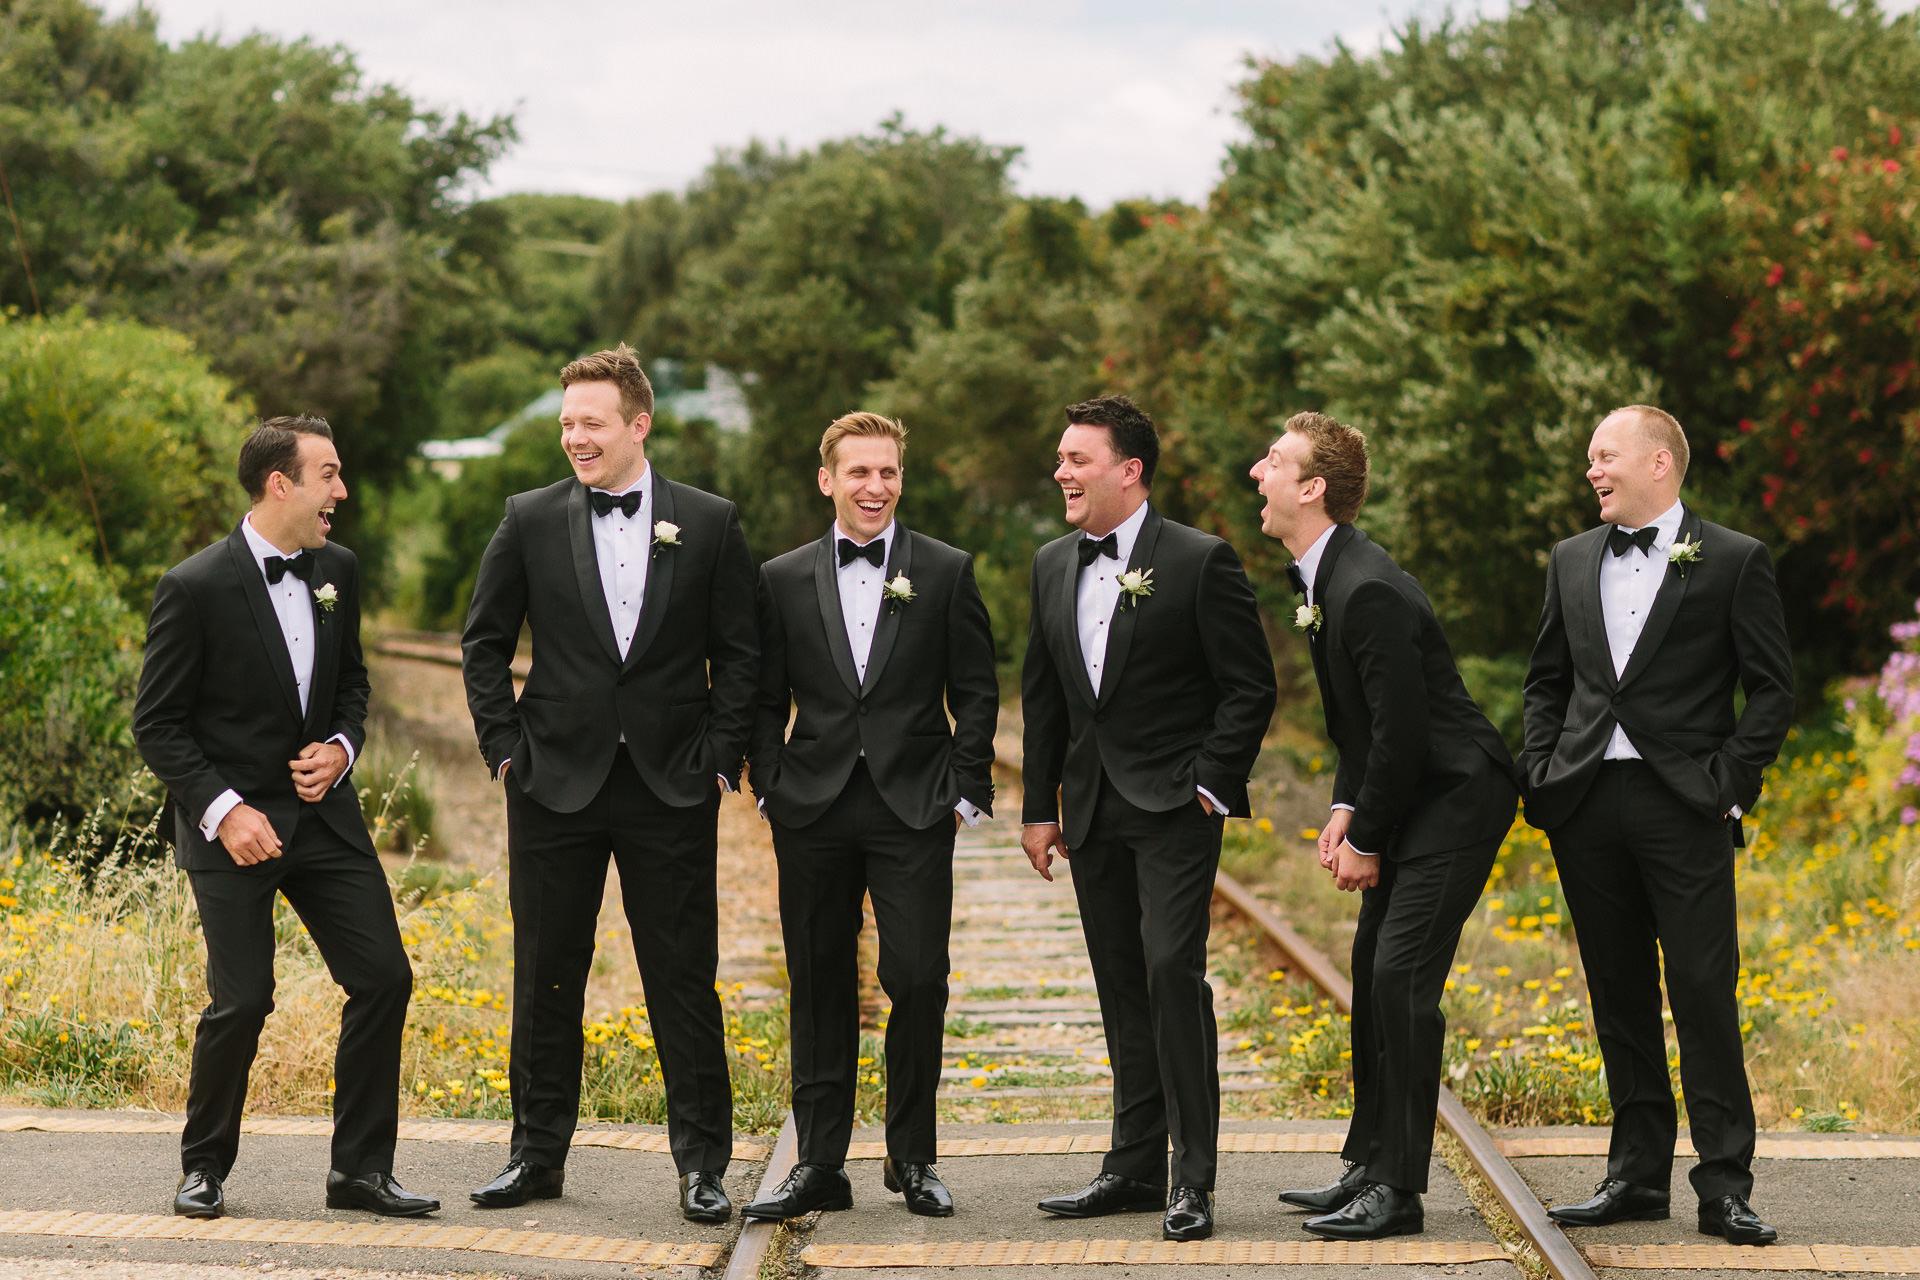 Port elliot wedding, dapper groom and groomsmen in black tie on train tracks